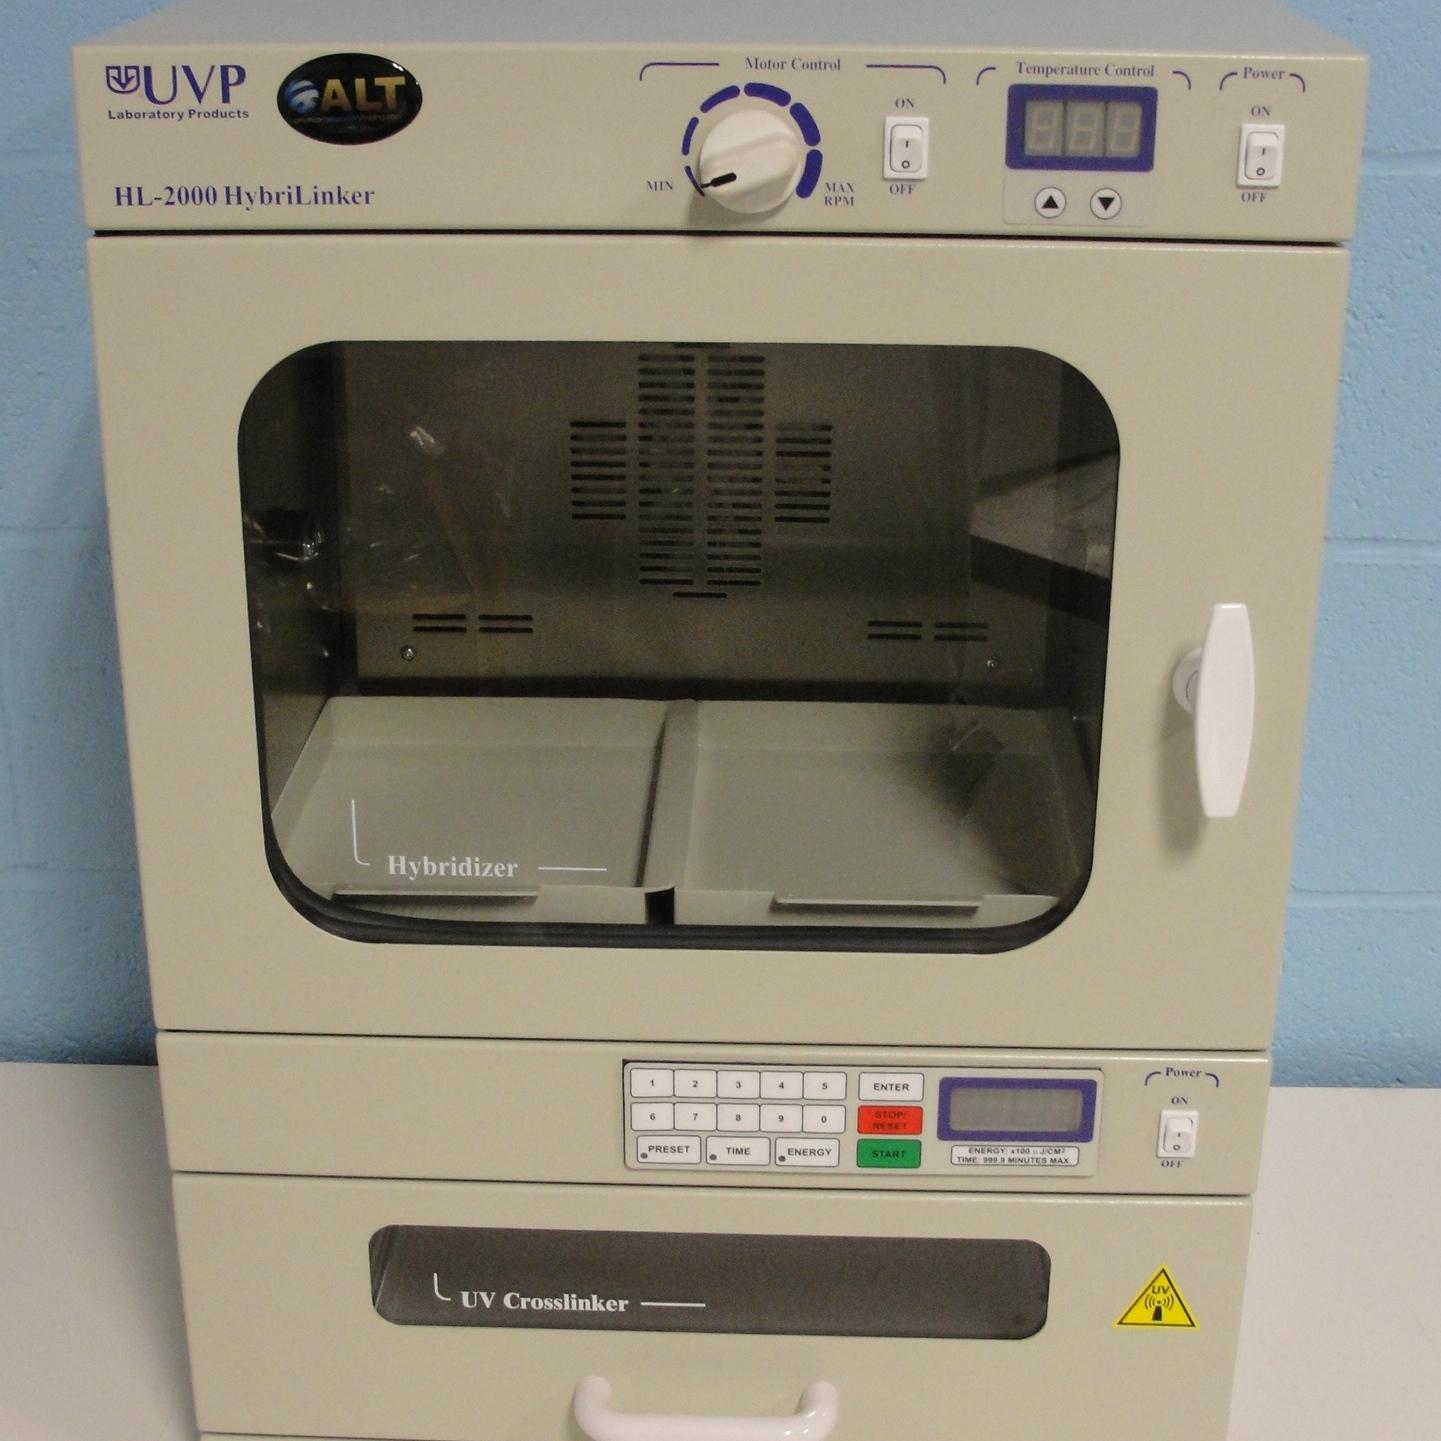 UVP HL-2000 HybriLinker Hybridization Oven P/N 95-0031-01 Image